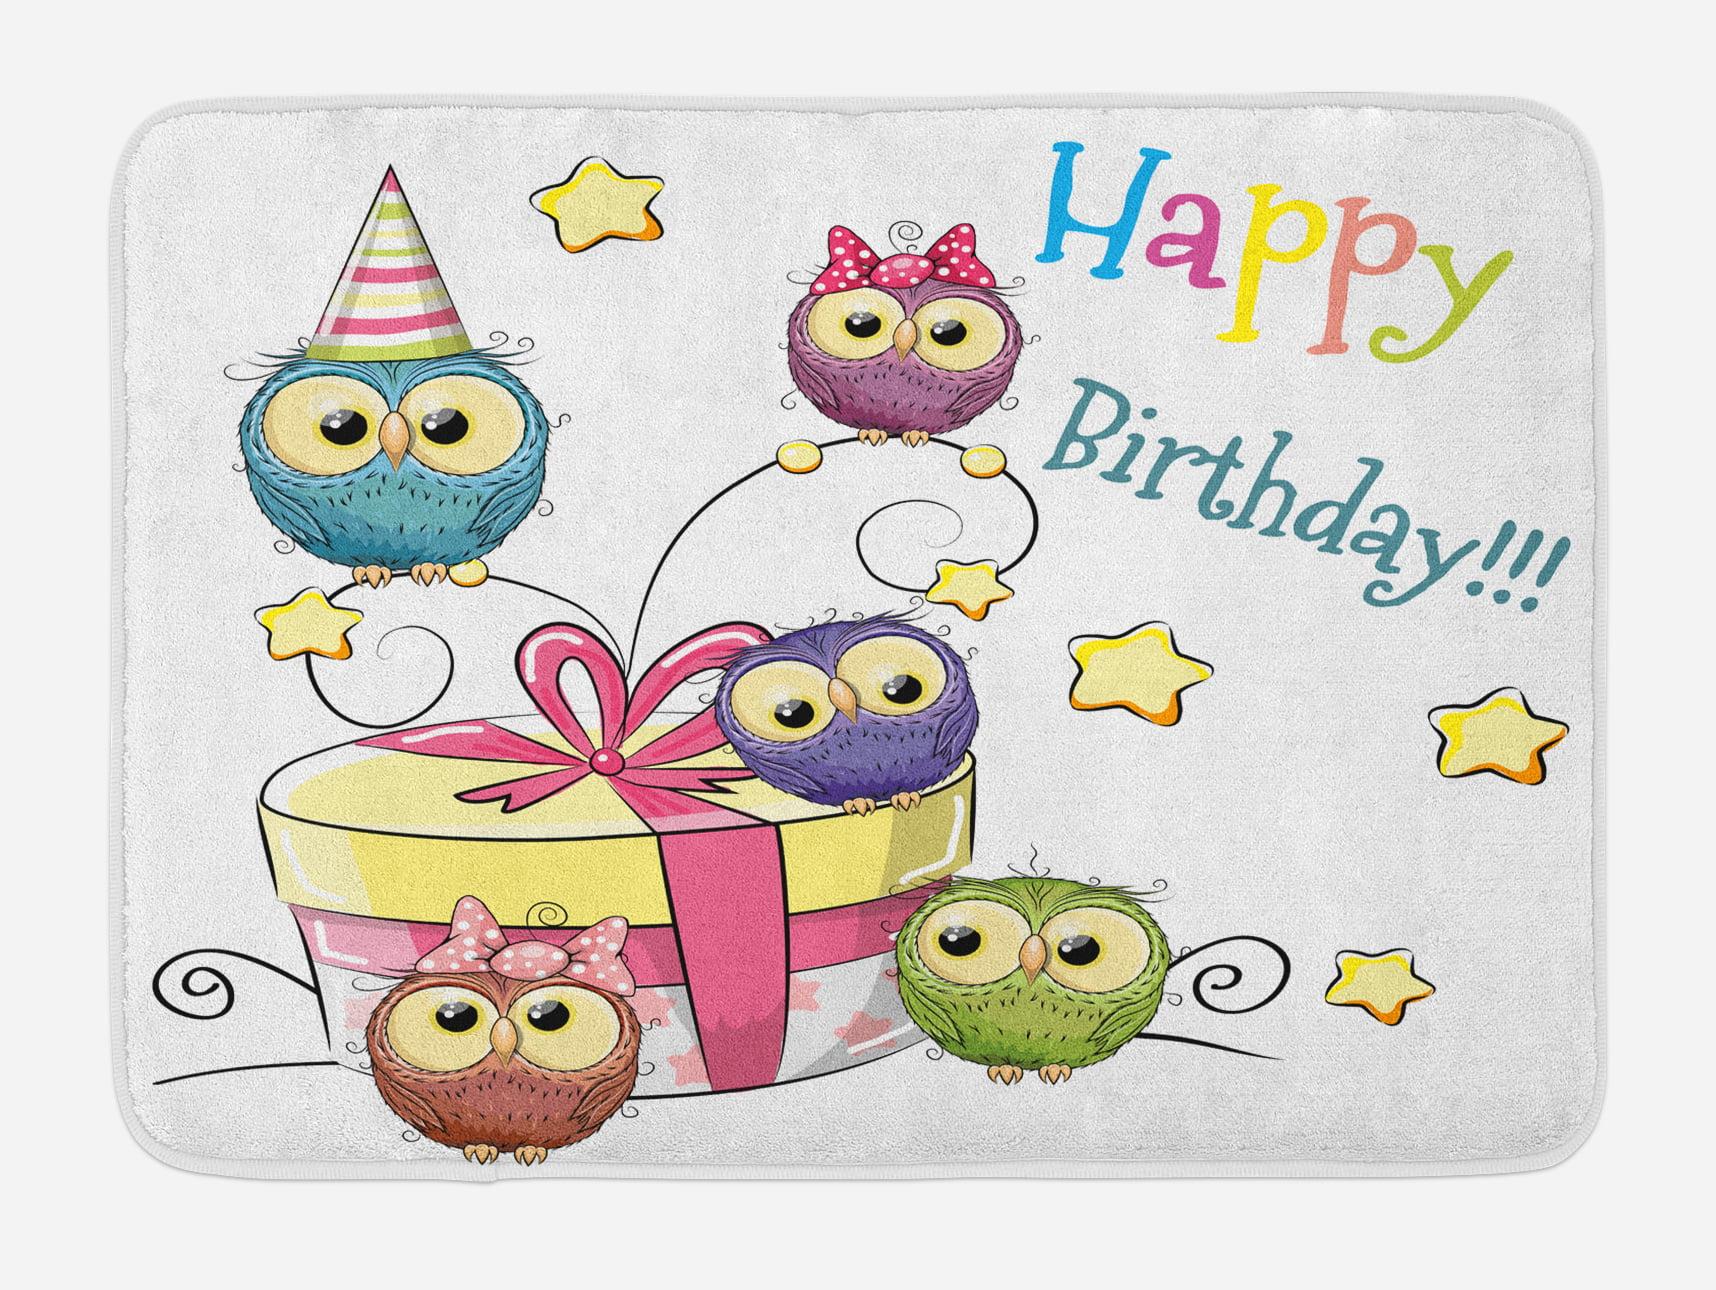 Kids Birthday Bath Mat, Sketchy Hand Drawn Baby Owls on Surprise Present Box and Stars... by 3decor llc